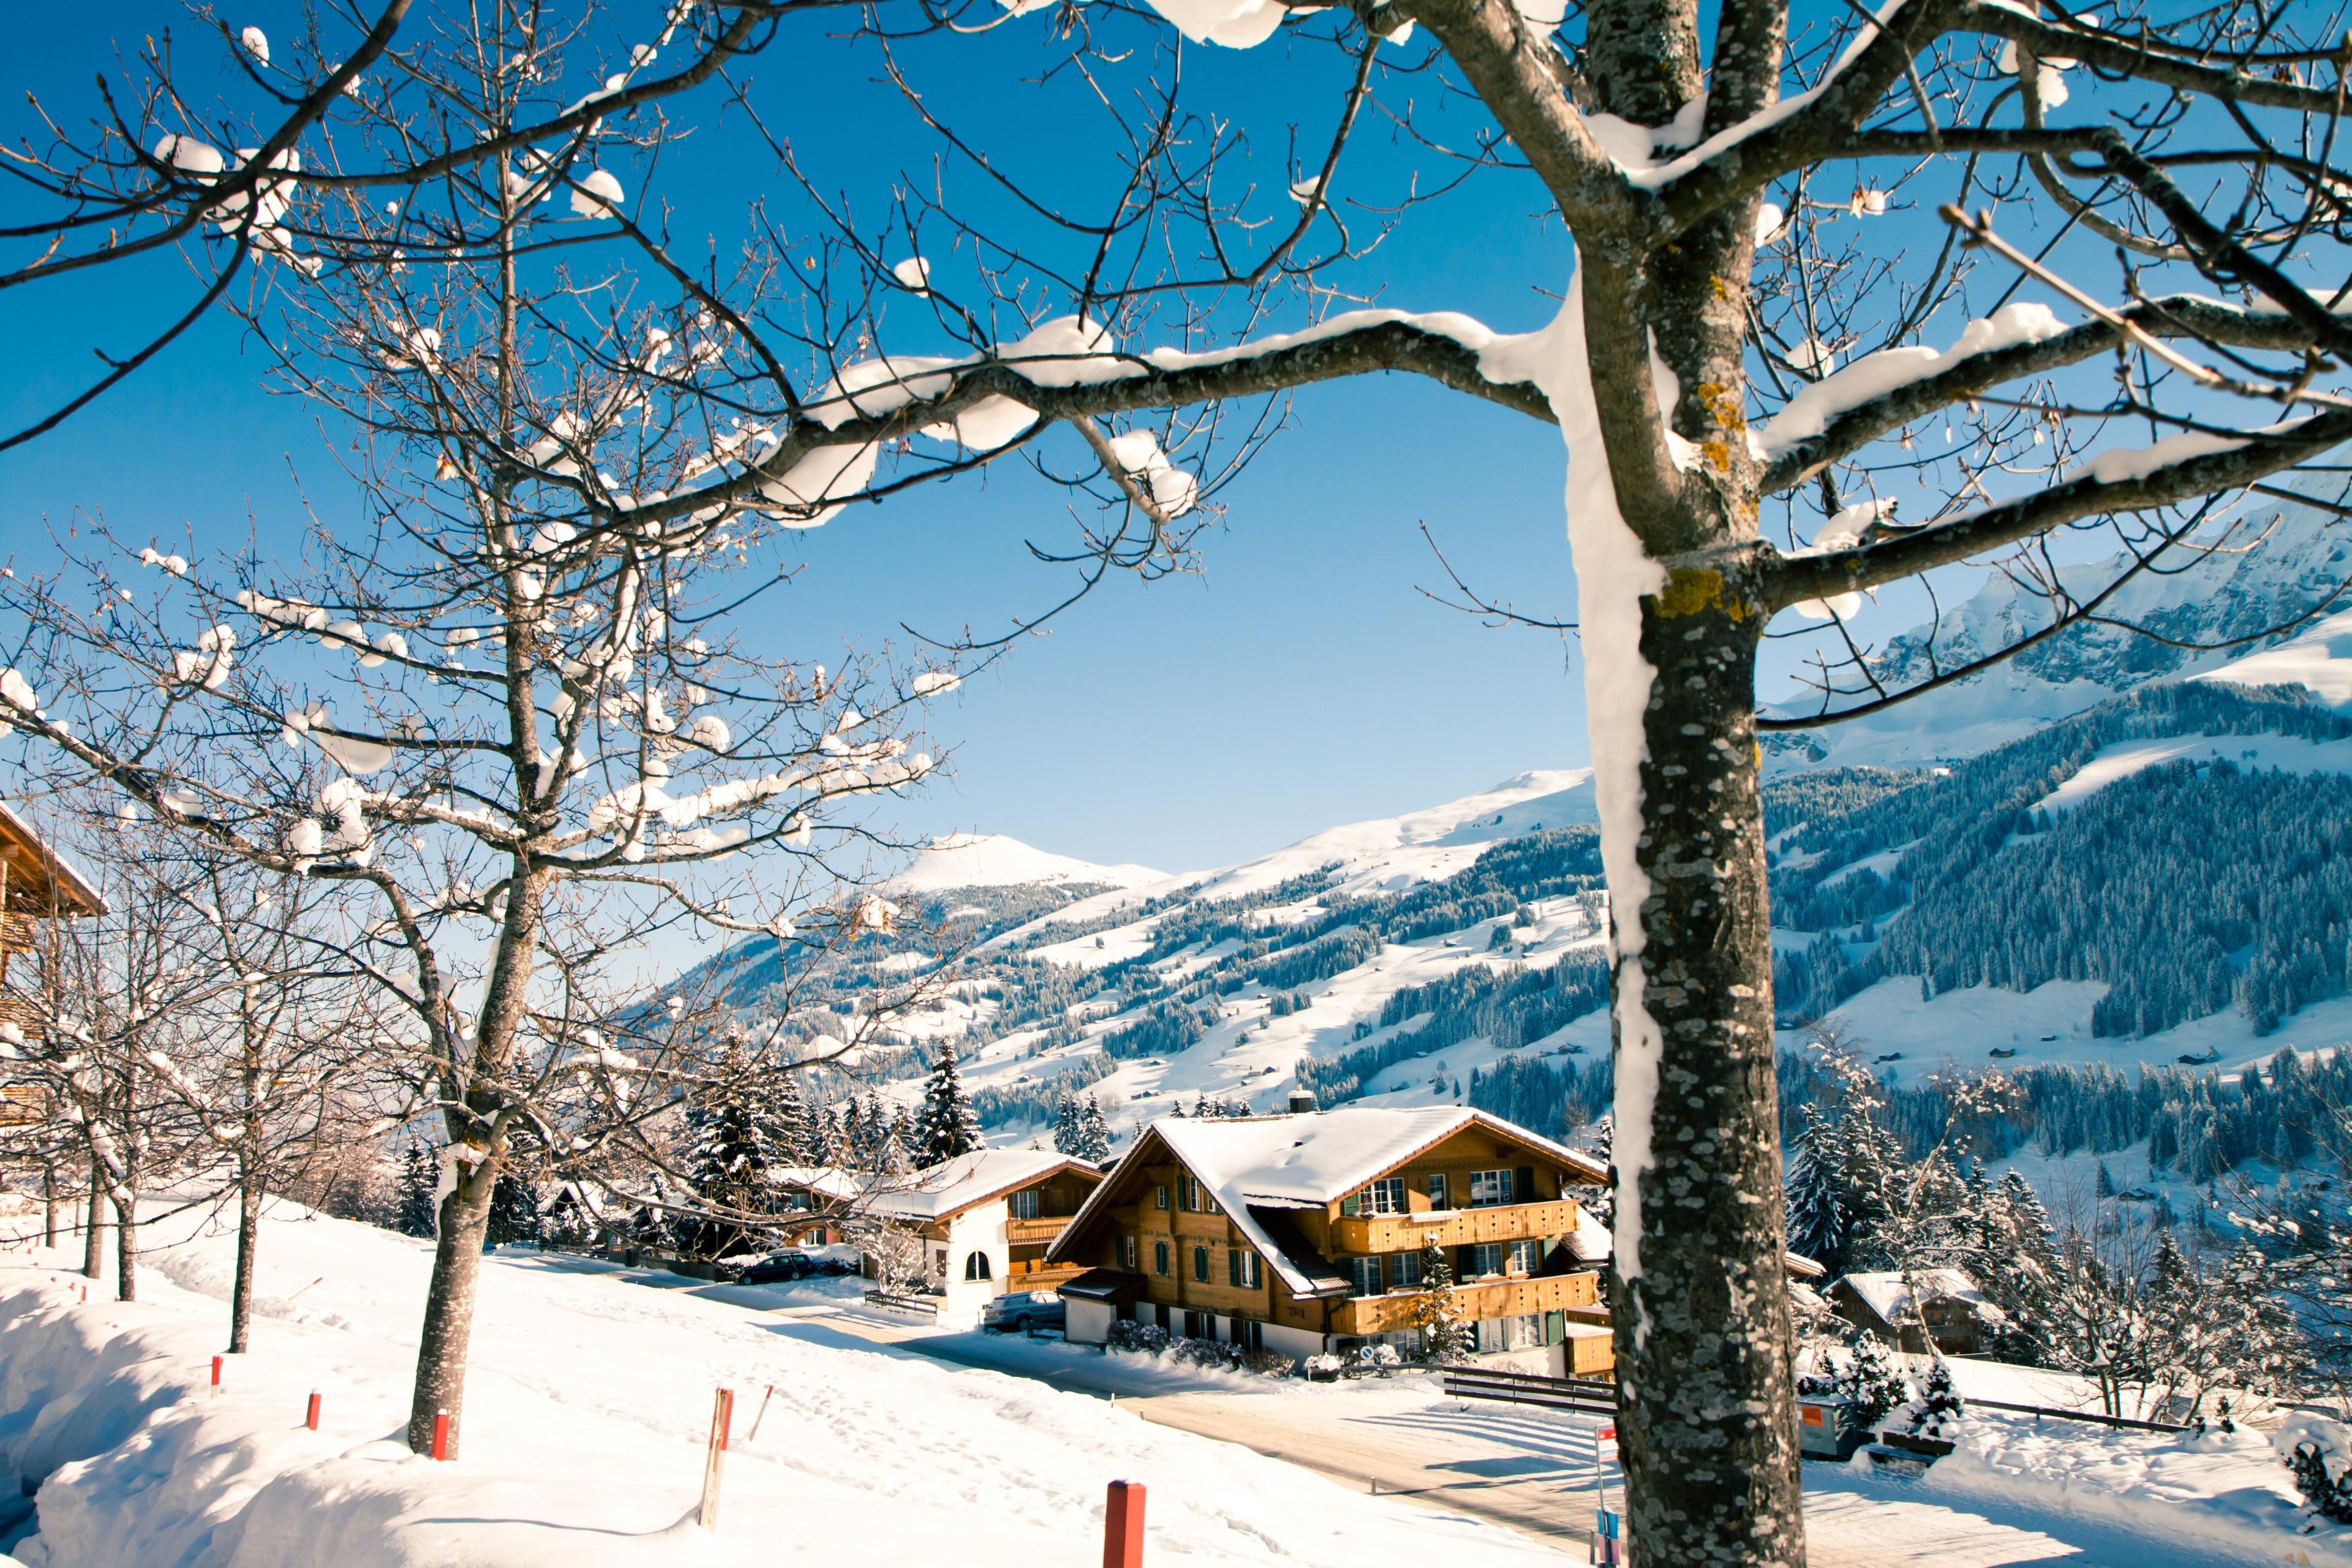 Adelboden, Canton of Bern, Switzerland